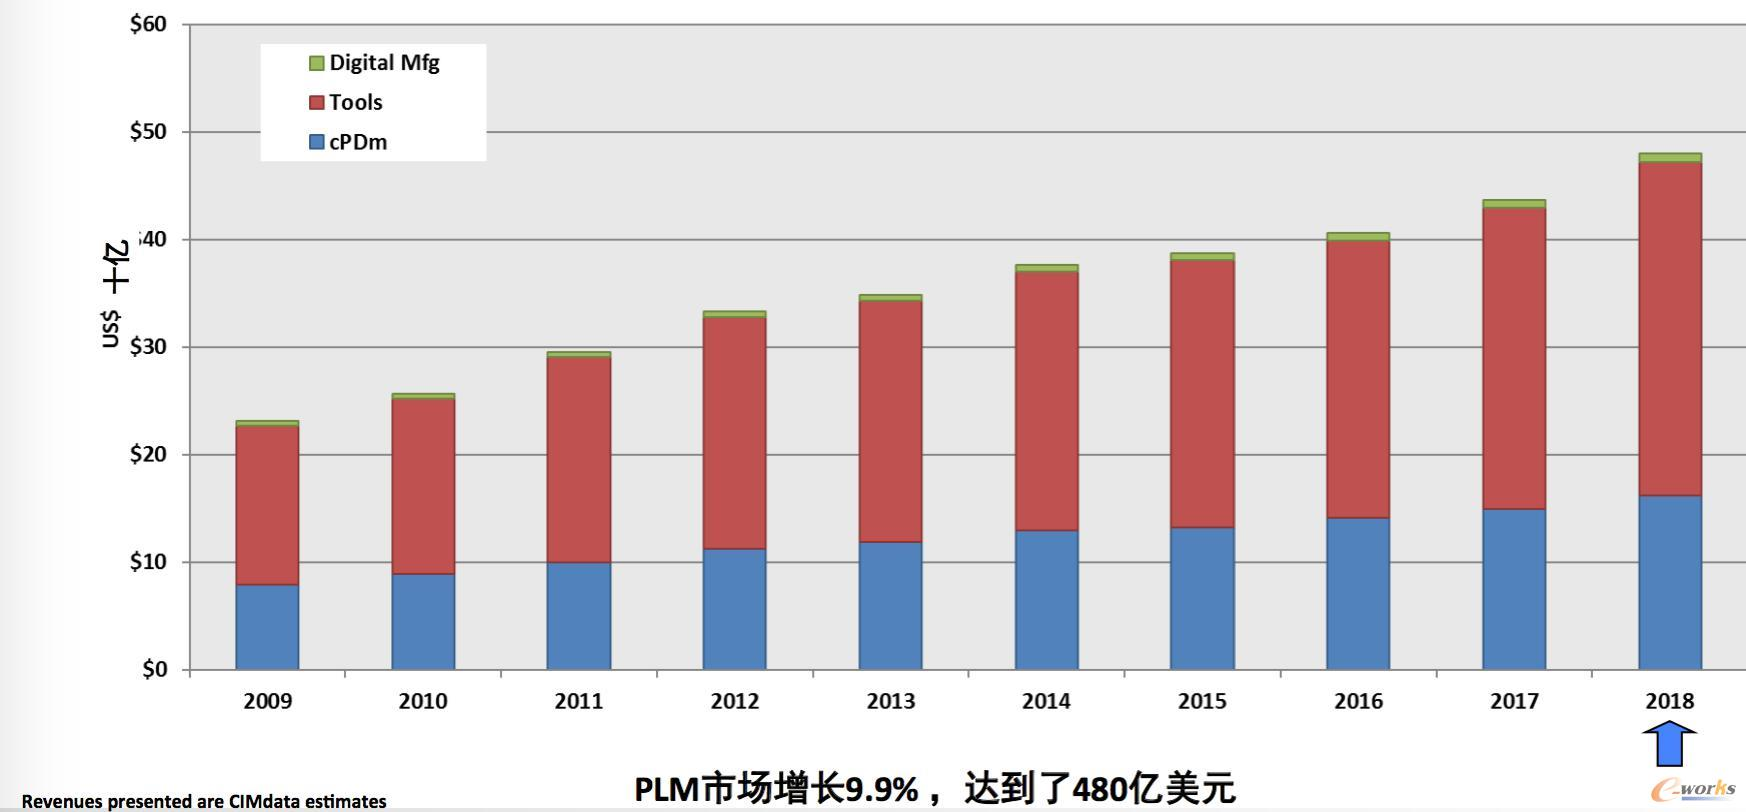 PLM市场增长超预期 数字化成重要驱动因素